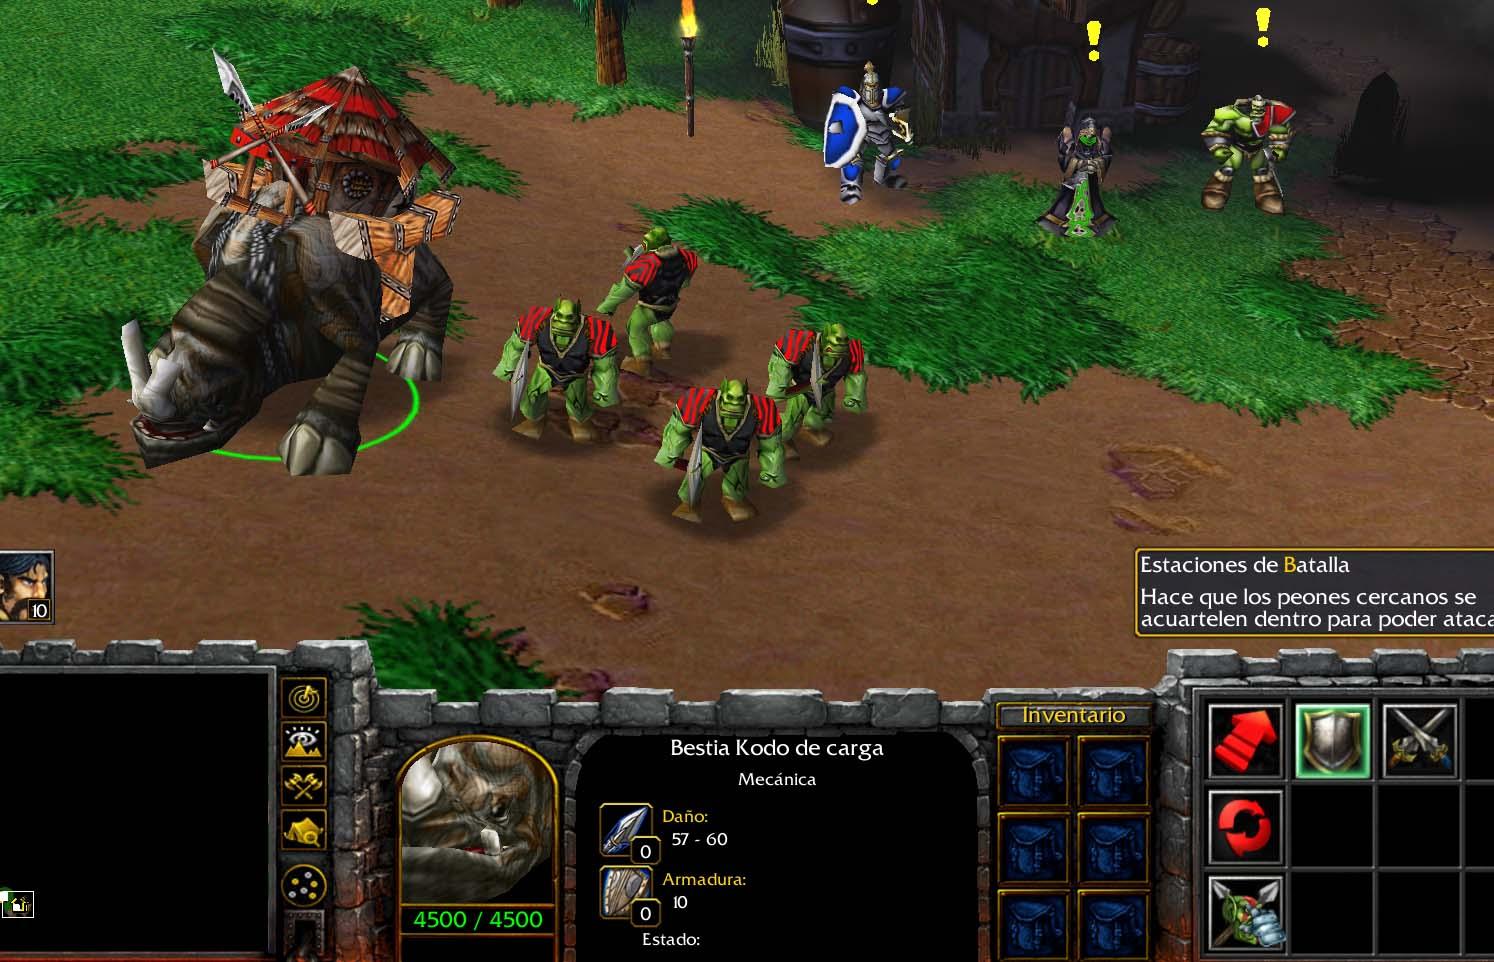 Kodo tower beast addon - Warcraft III: Frozen Throne - Mod DB